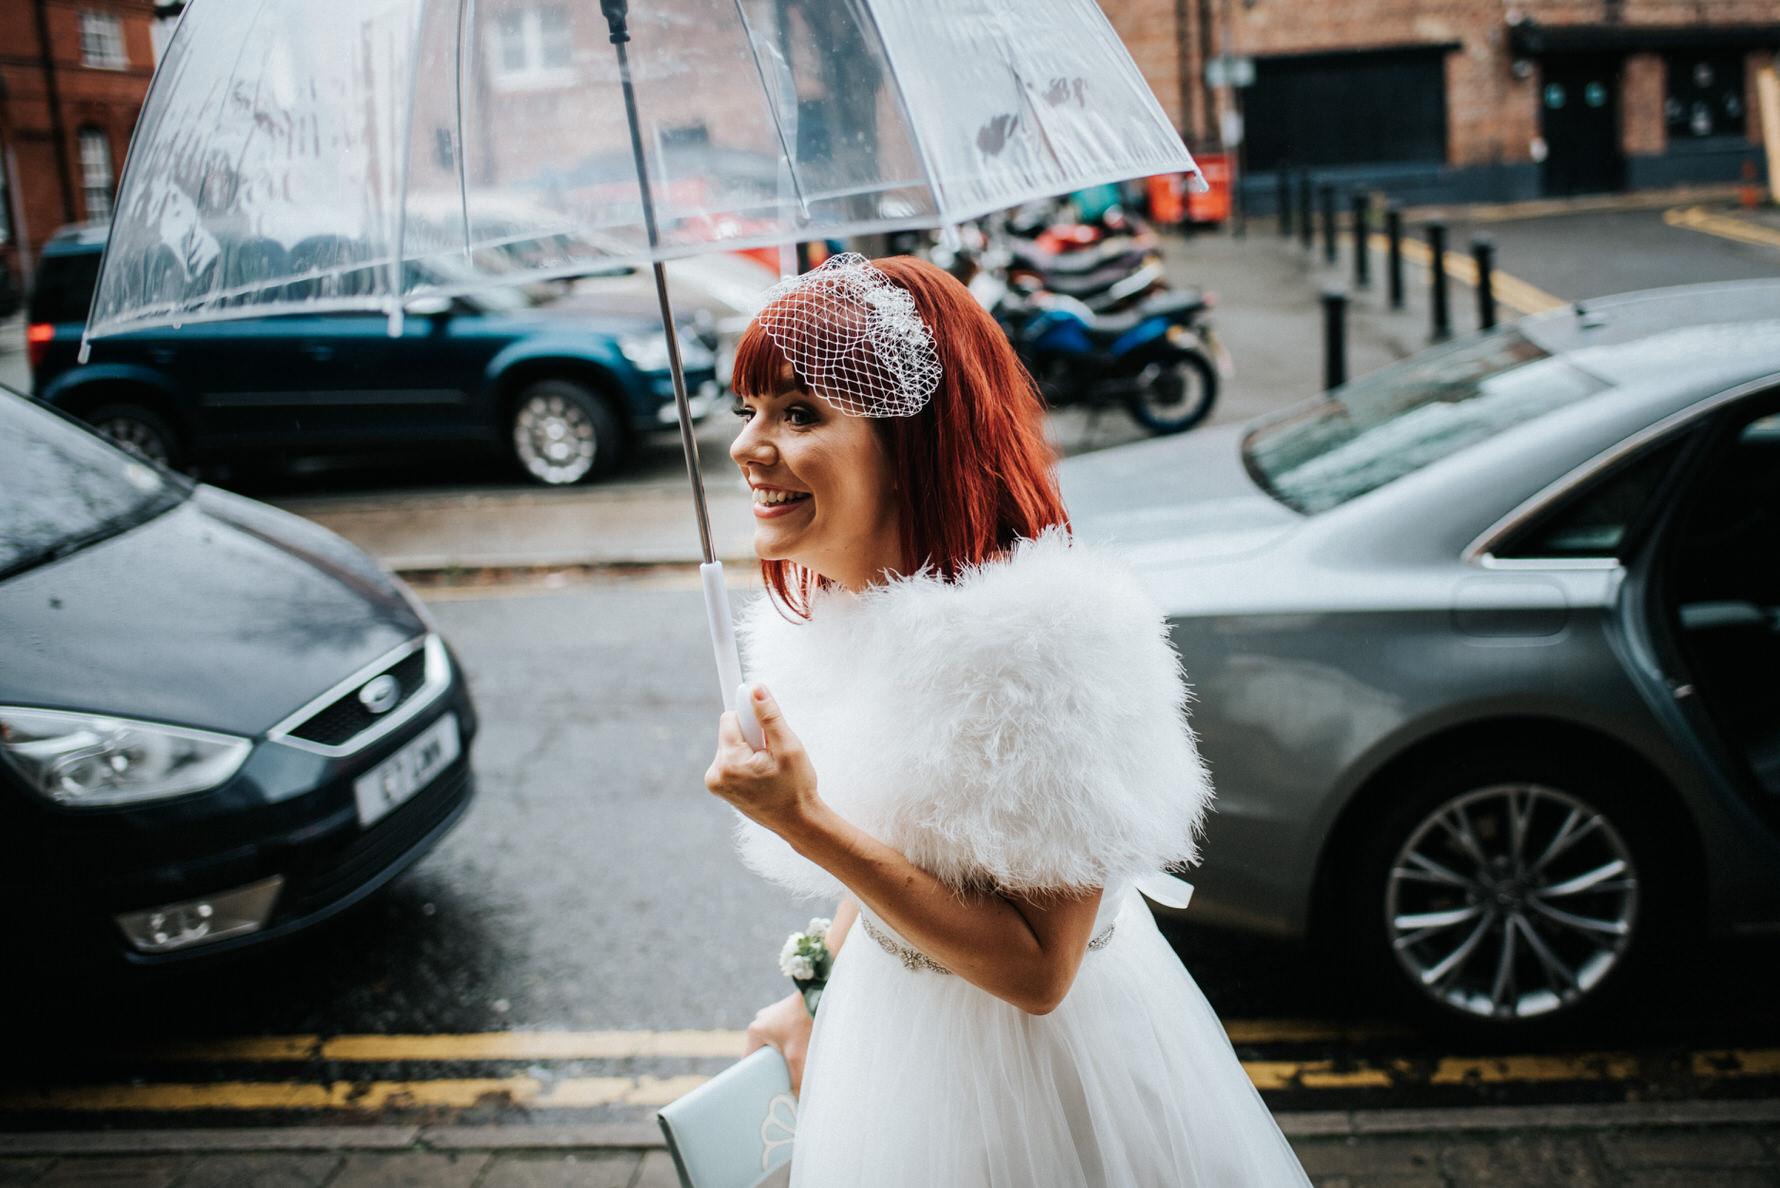 Cheshire Wedding Photojournalism bride with umbrella on way to ceremony